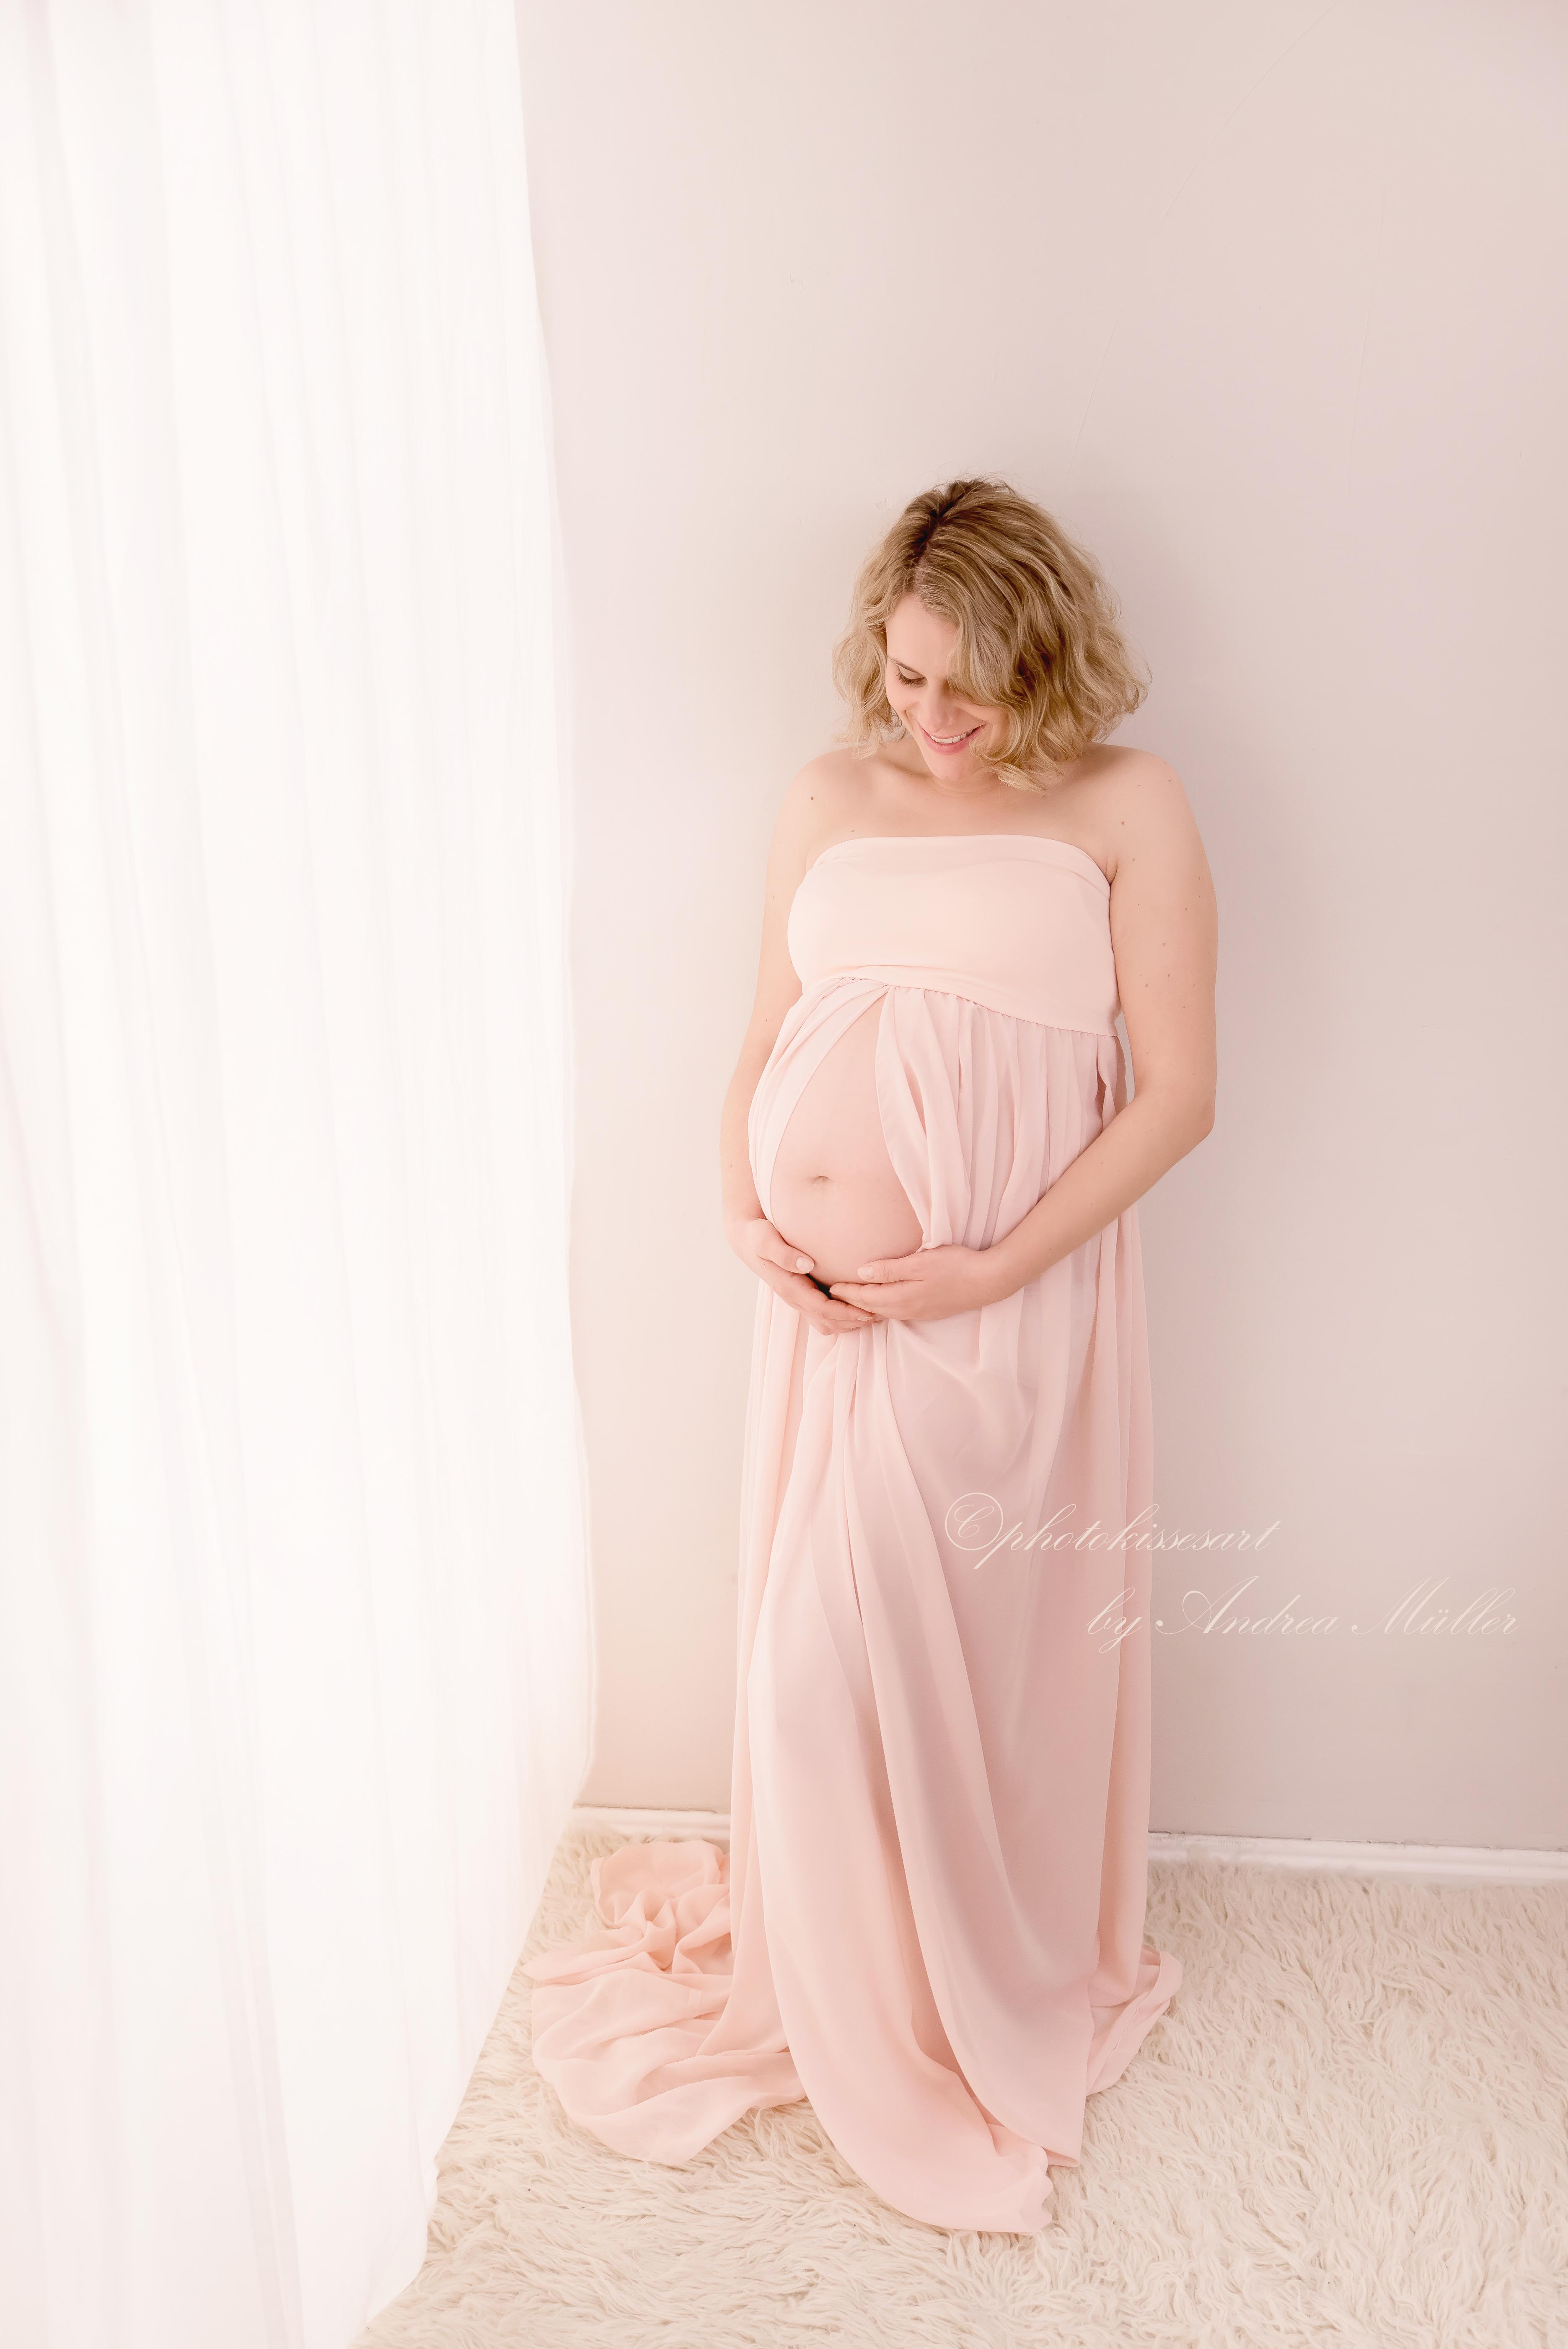 Babyfotografie Langenfeld (1)